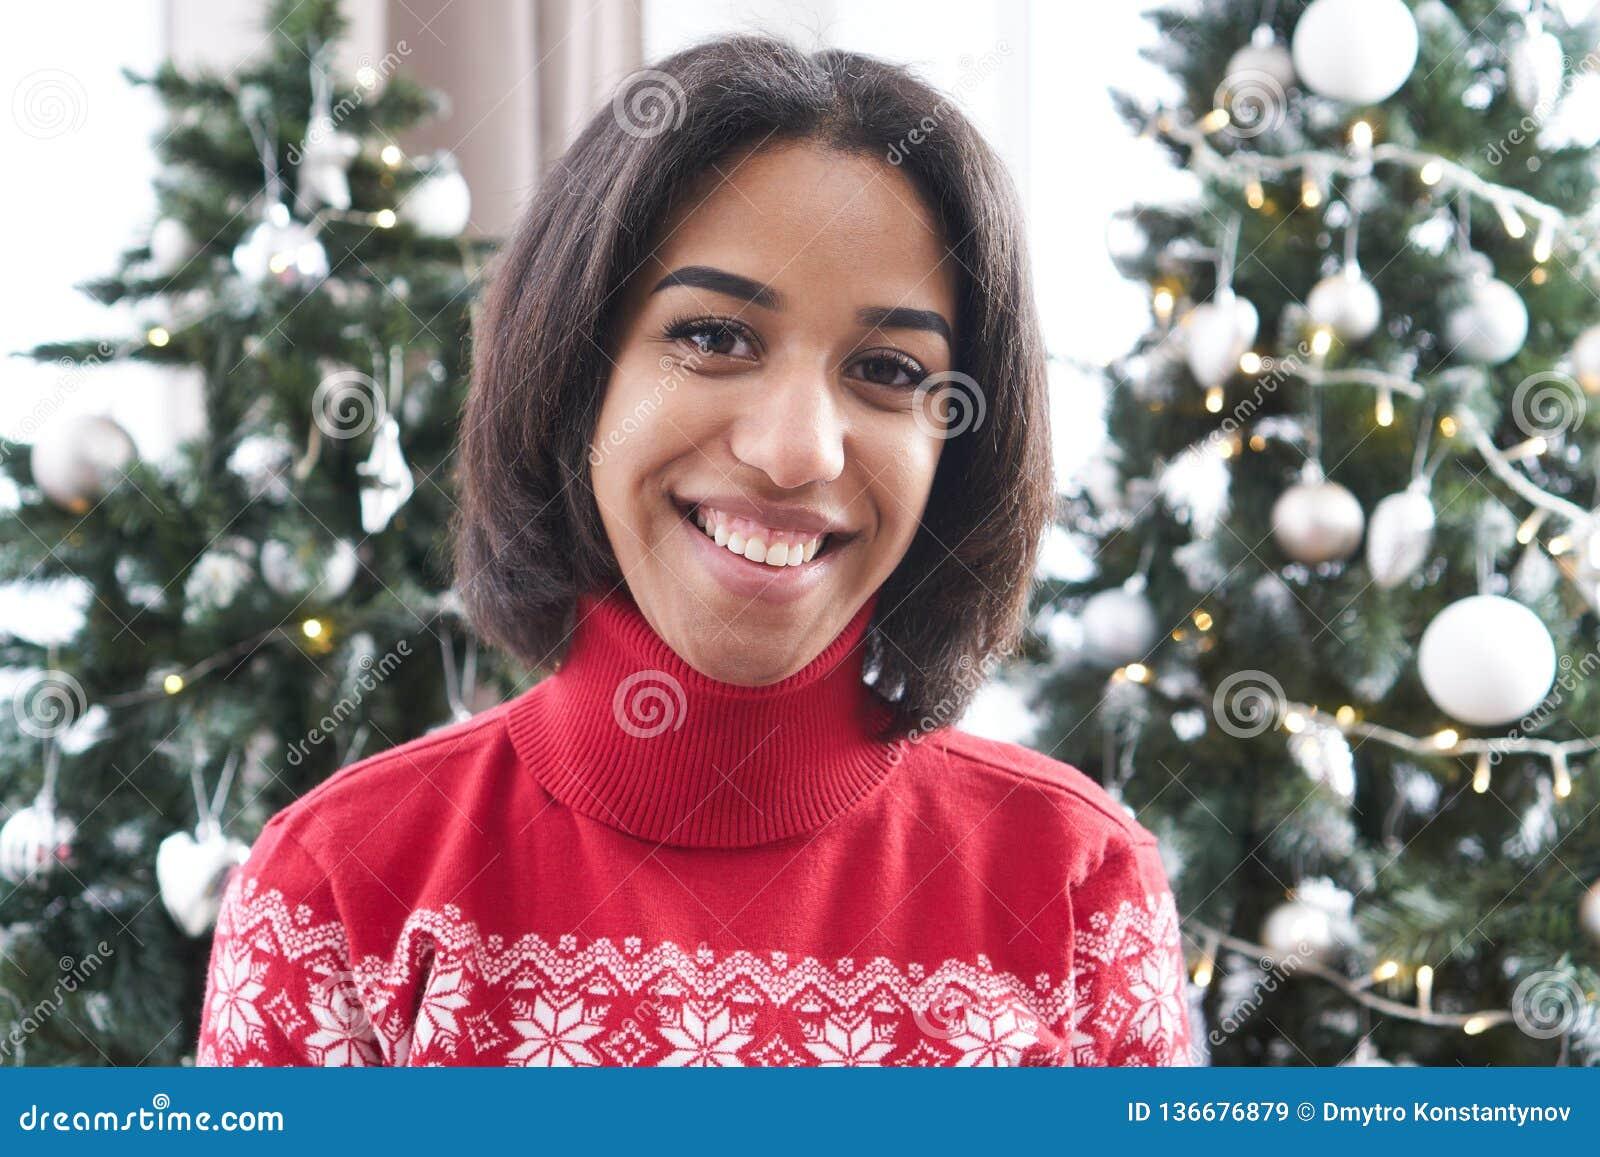 Happy teenage girl in front of Christmas tree